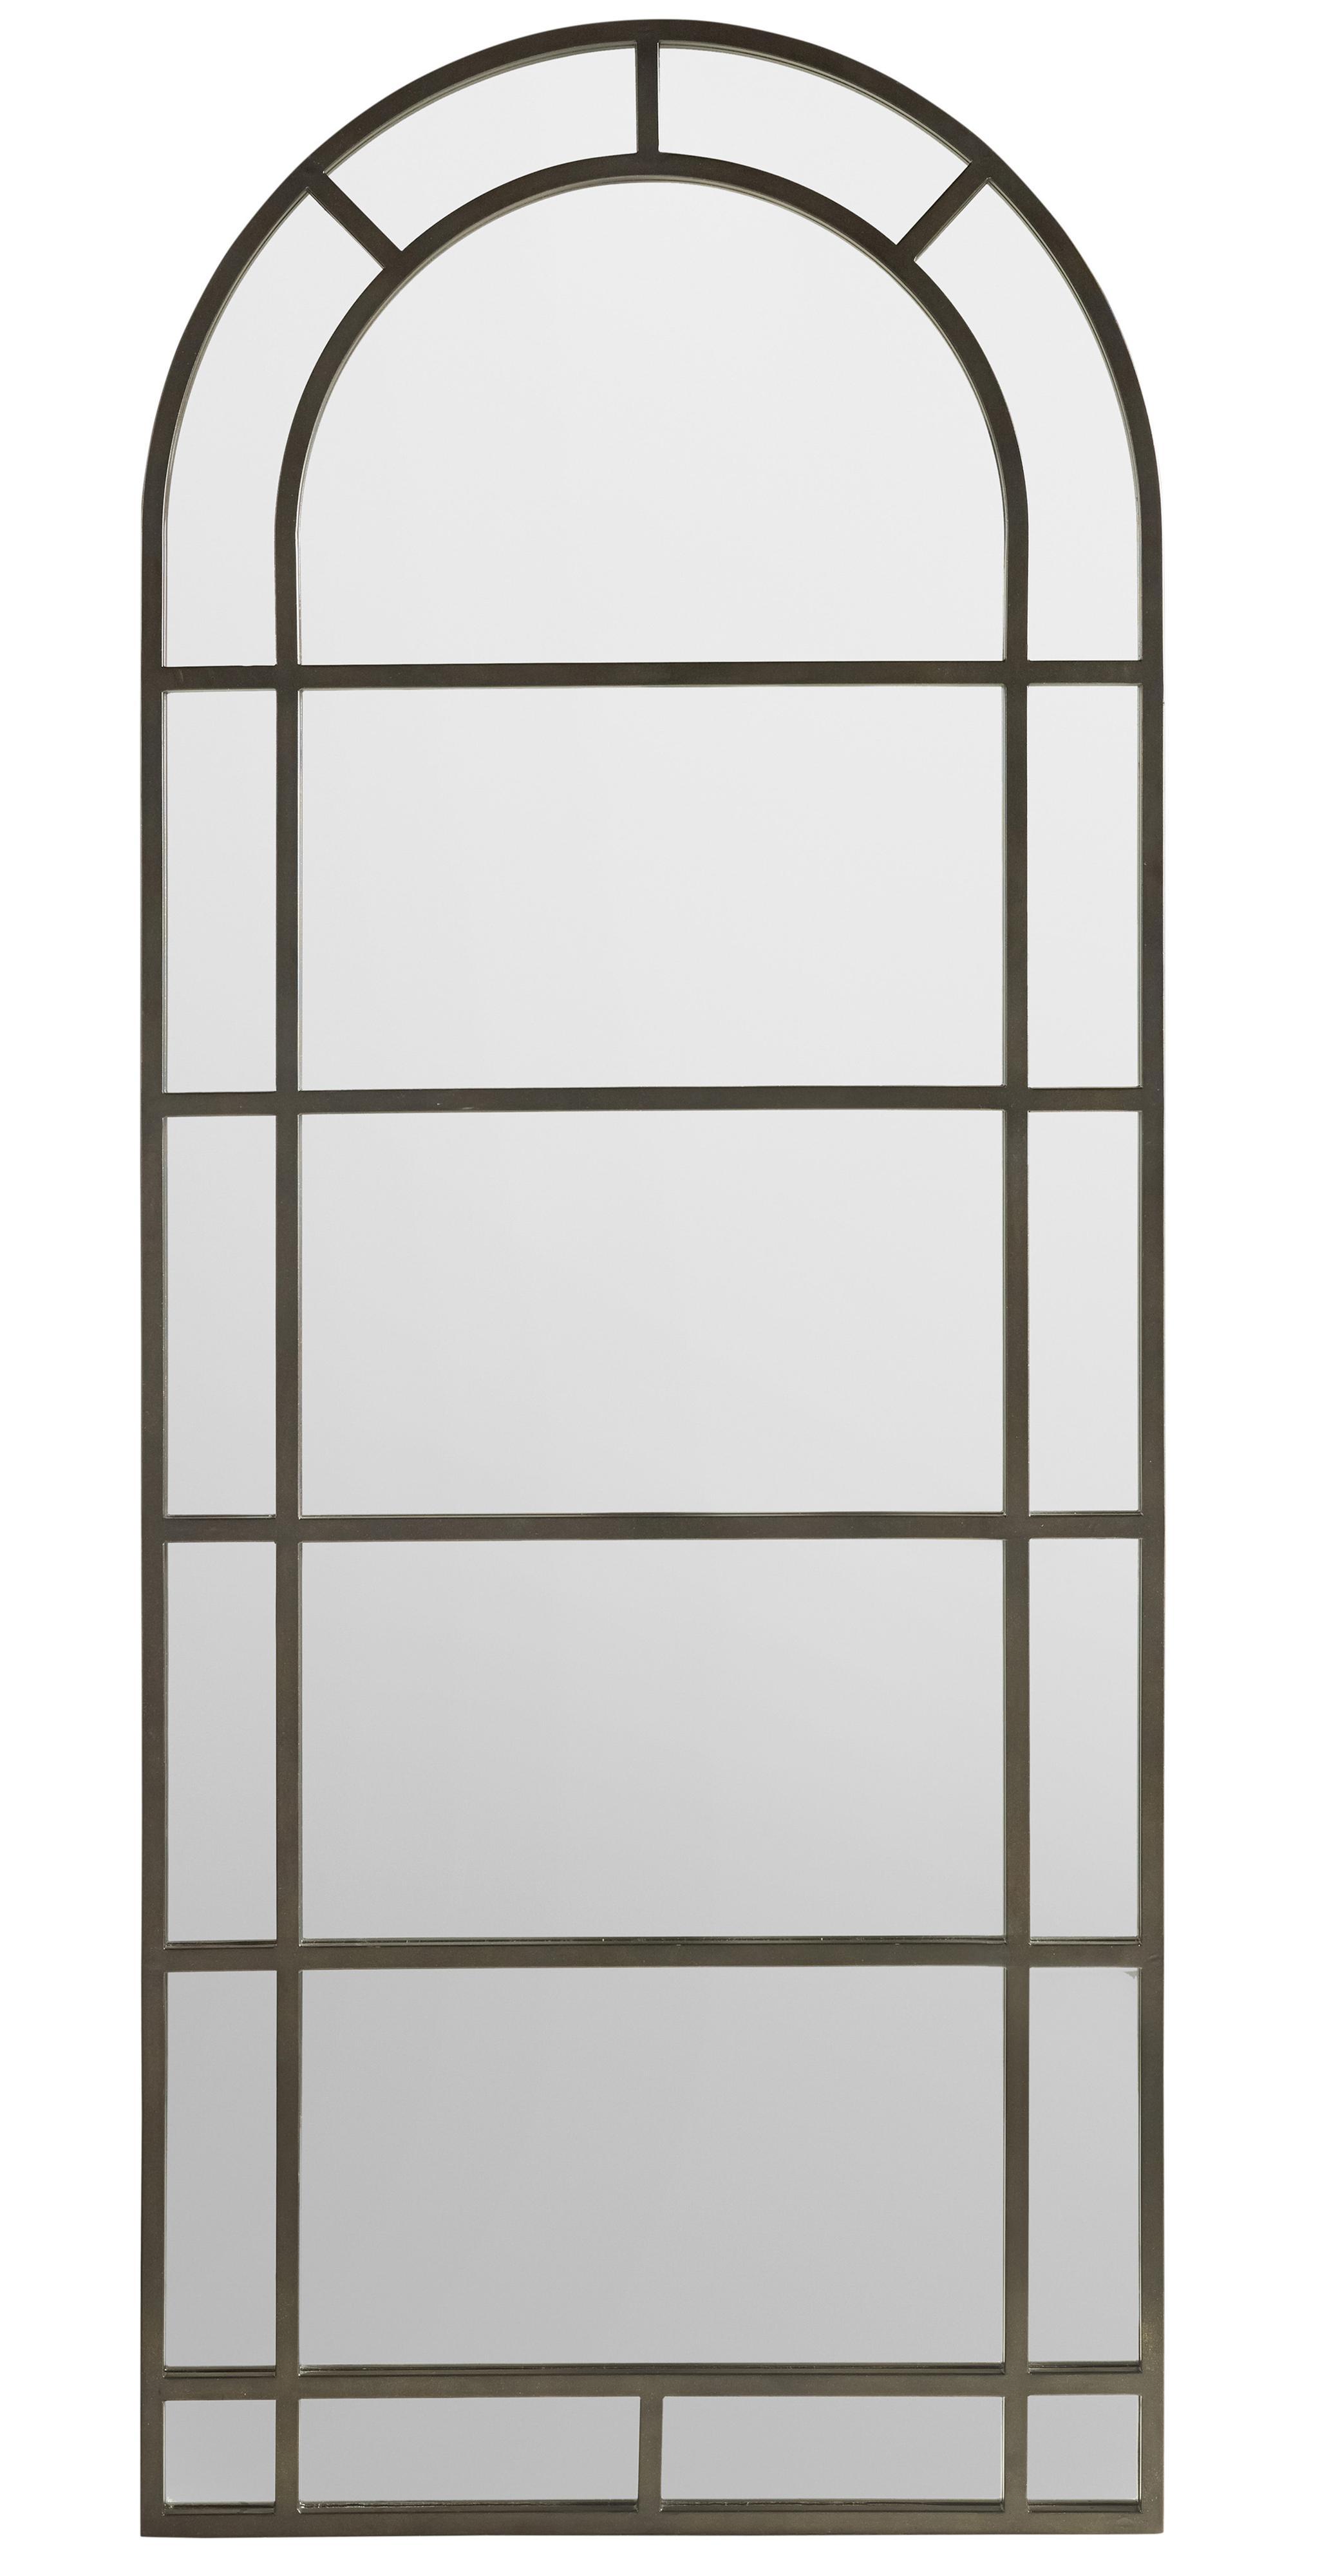 Hamilton Home Corsica Metal Floor Mirror - Item Number: 5480-90009